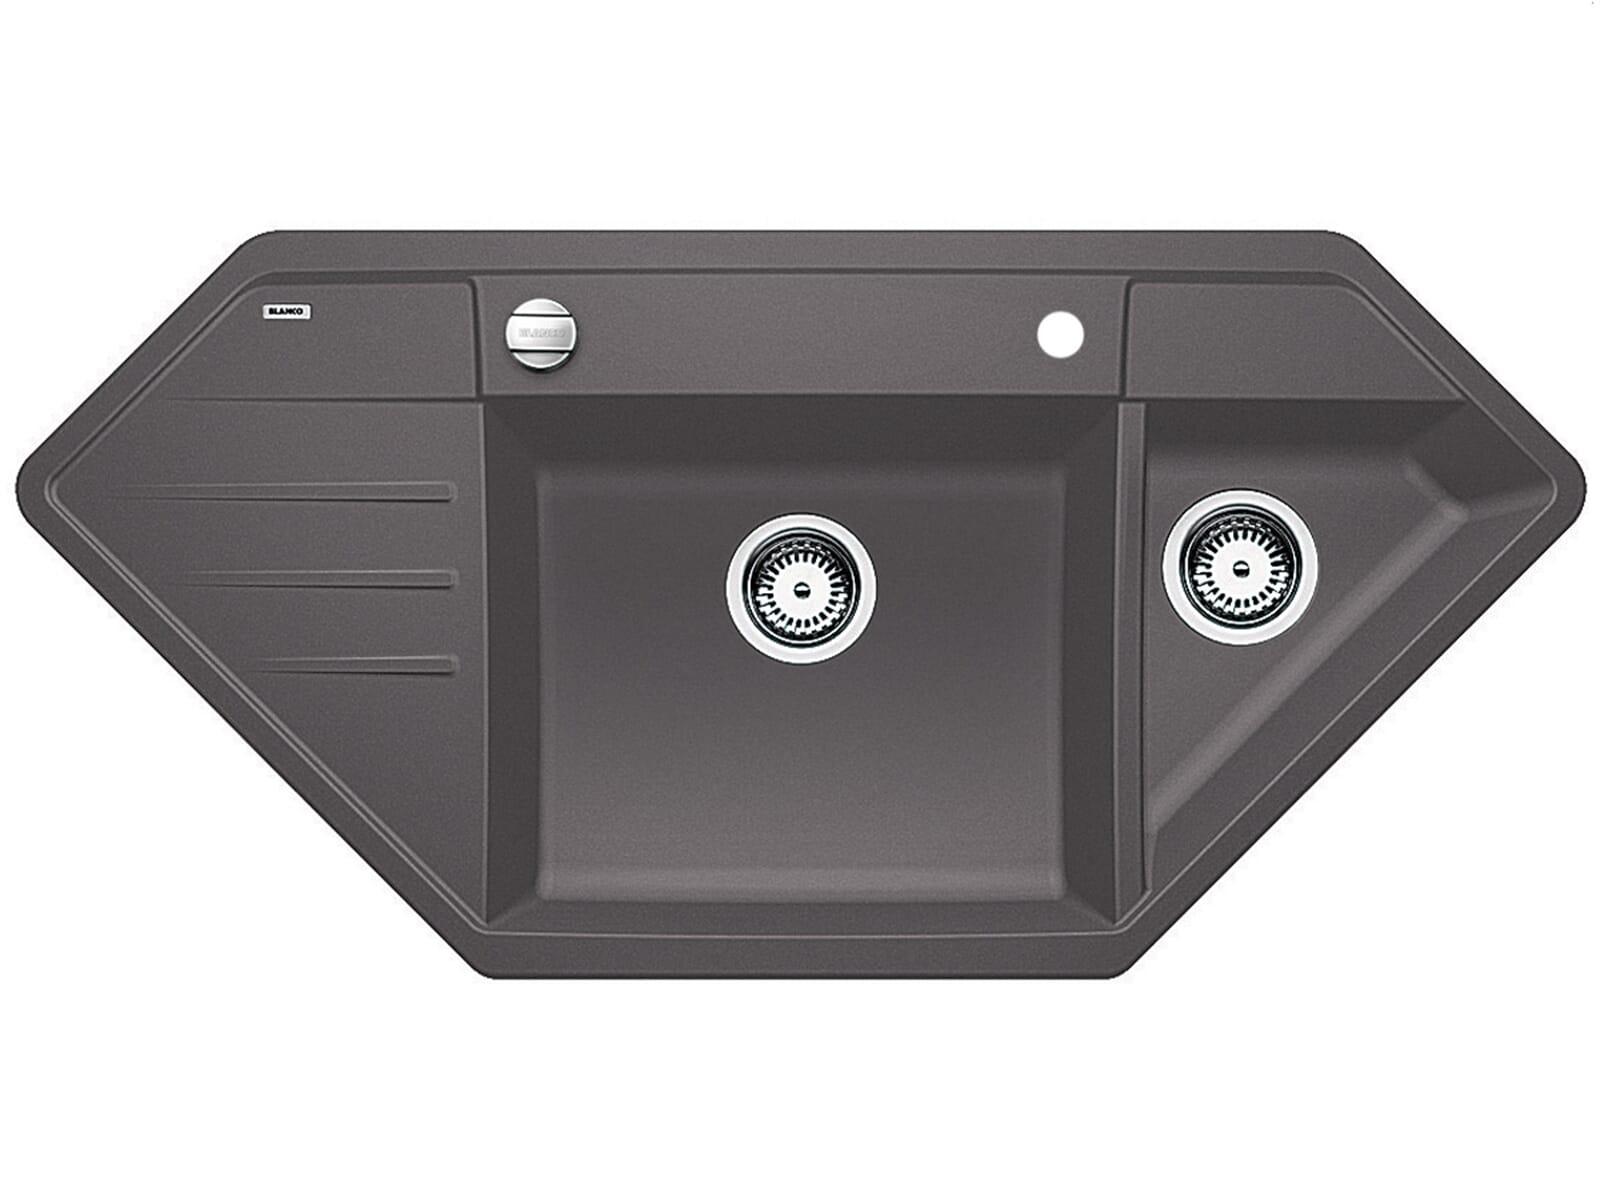 blanco lexa 9 e felsgrau granit sp le einbau auflage 90er. Black Bedroom Furniture Sets. Home Design Ideas